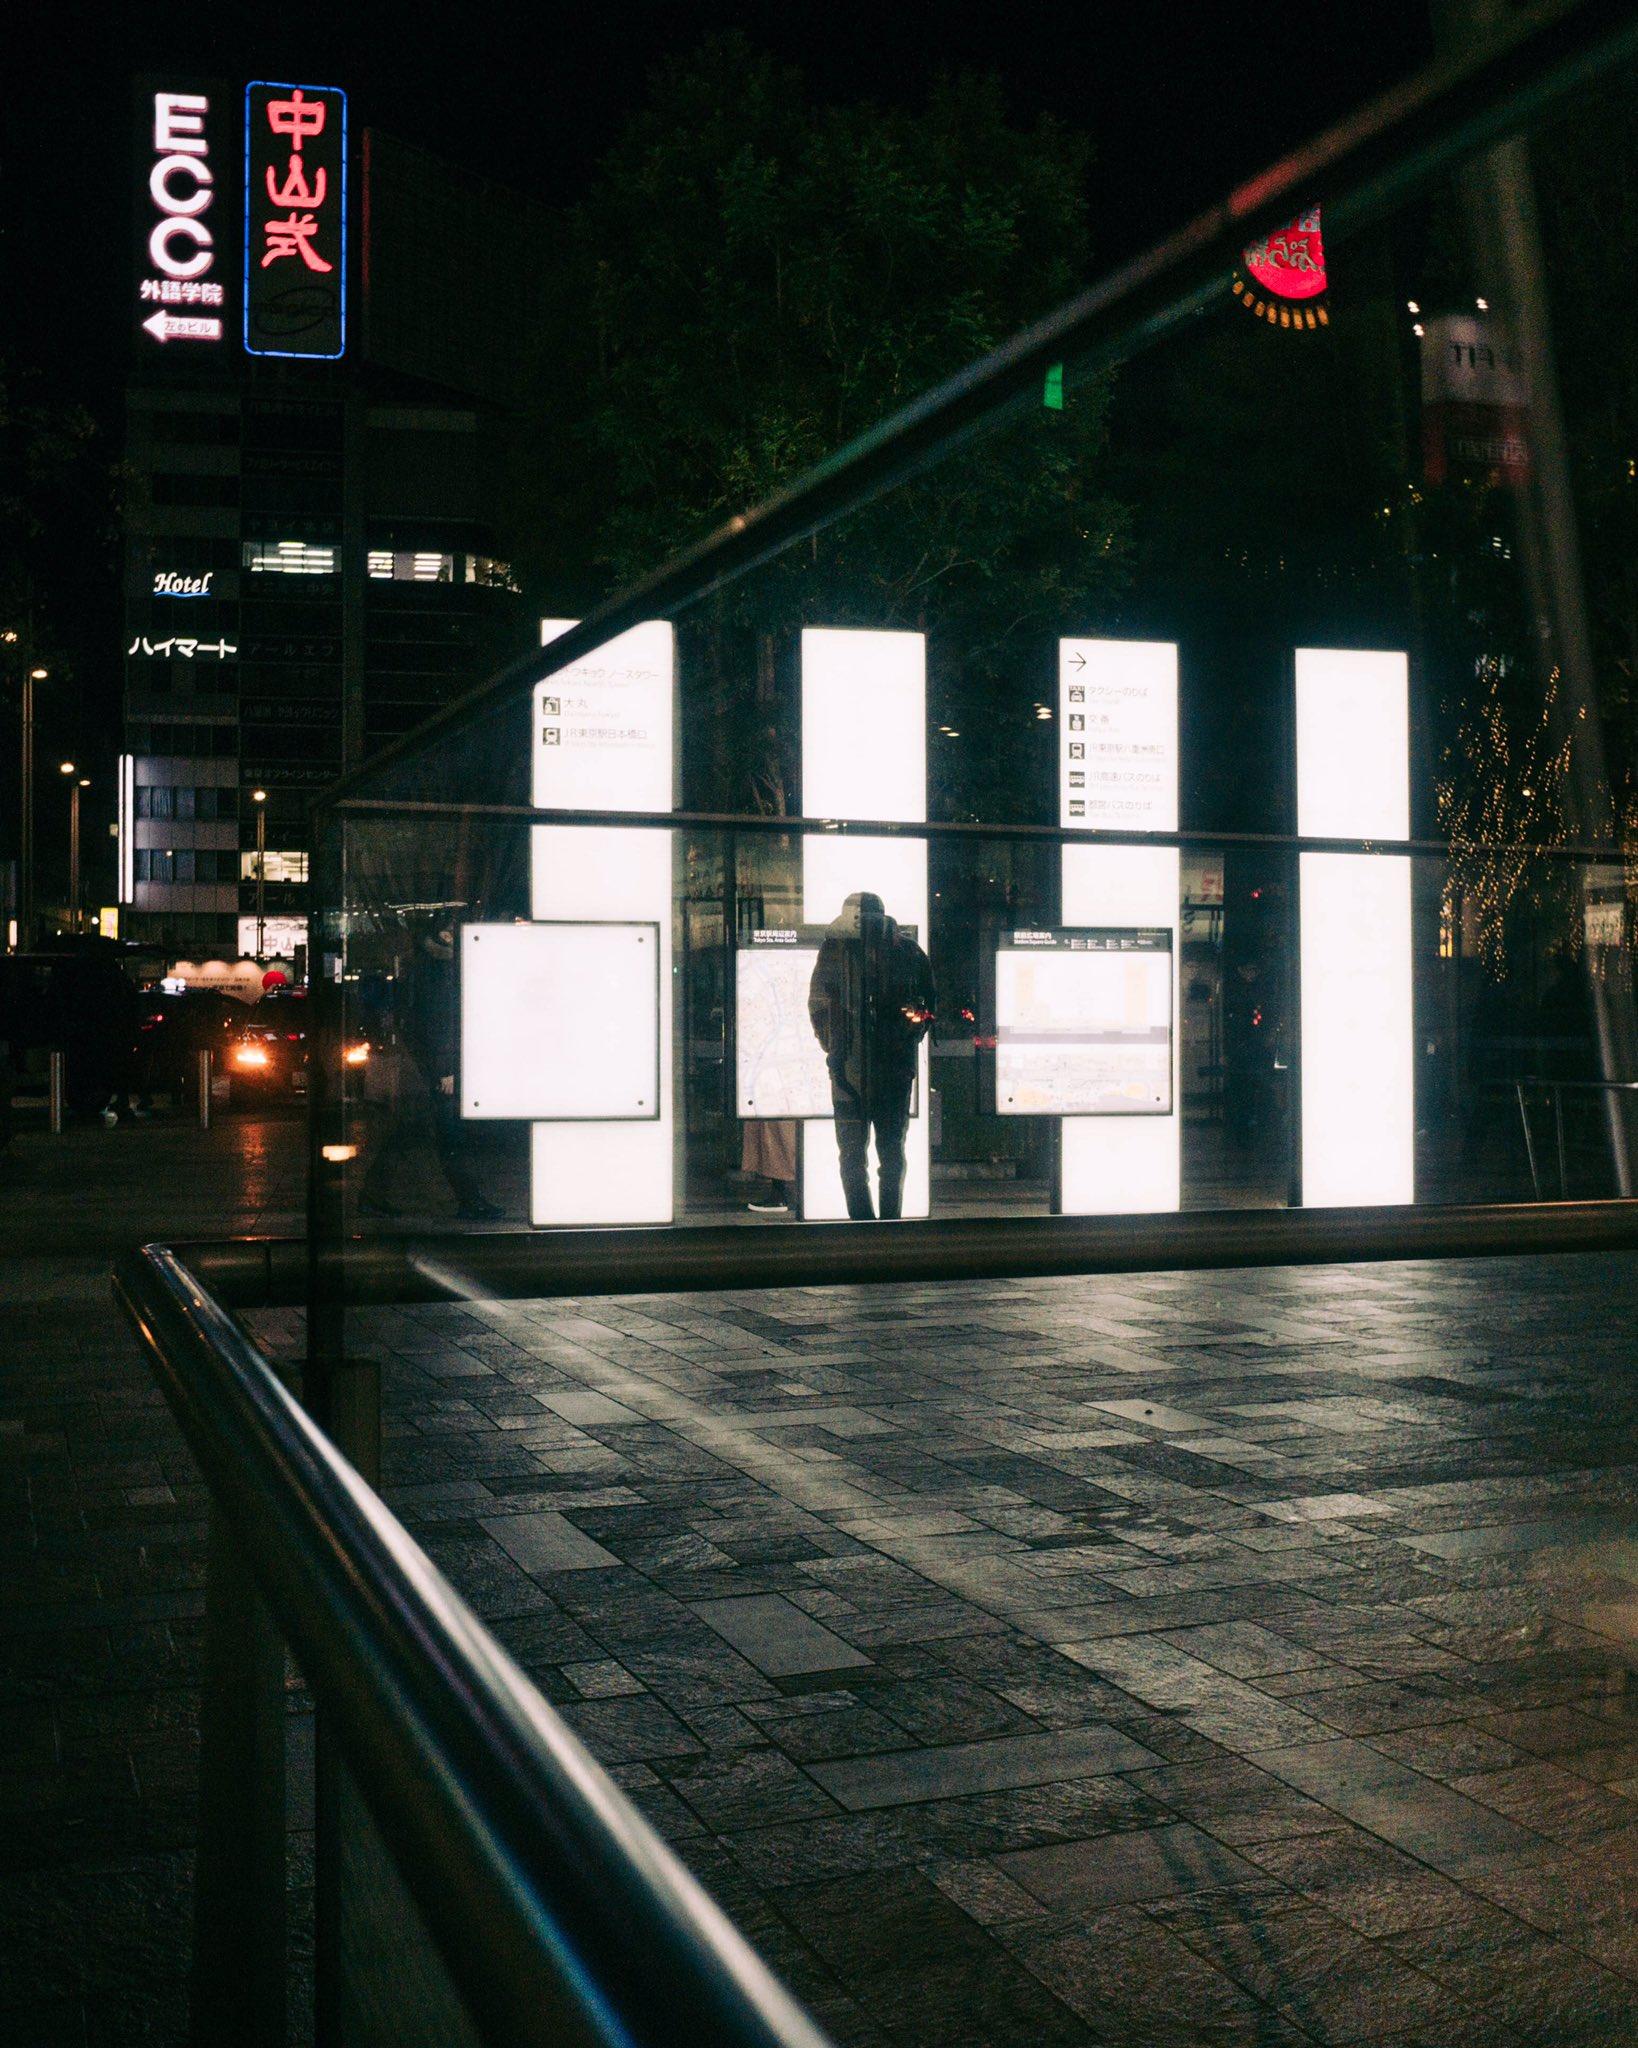 urban_street_photography_36.jpg